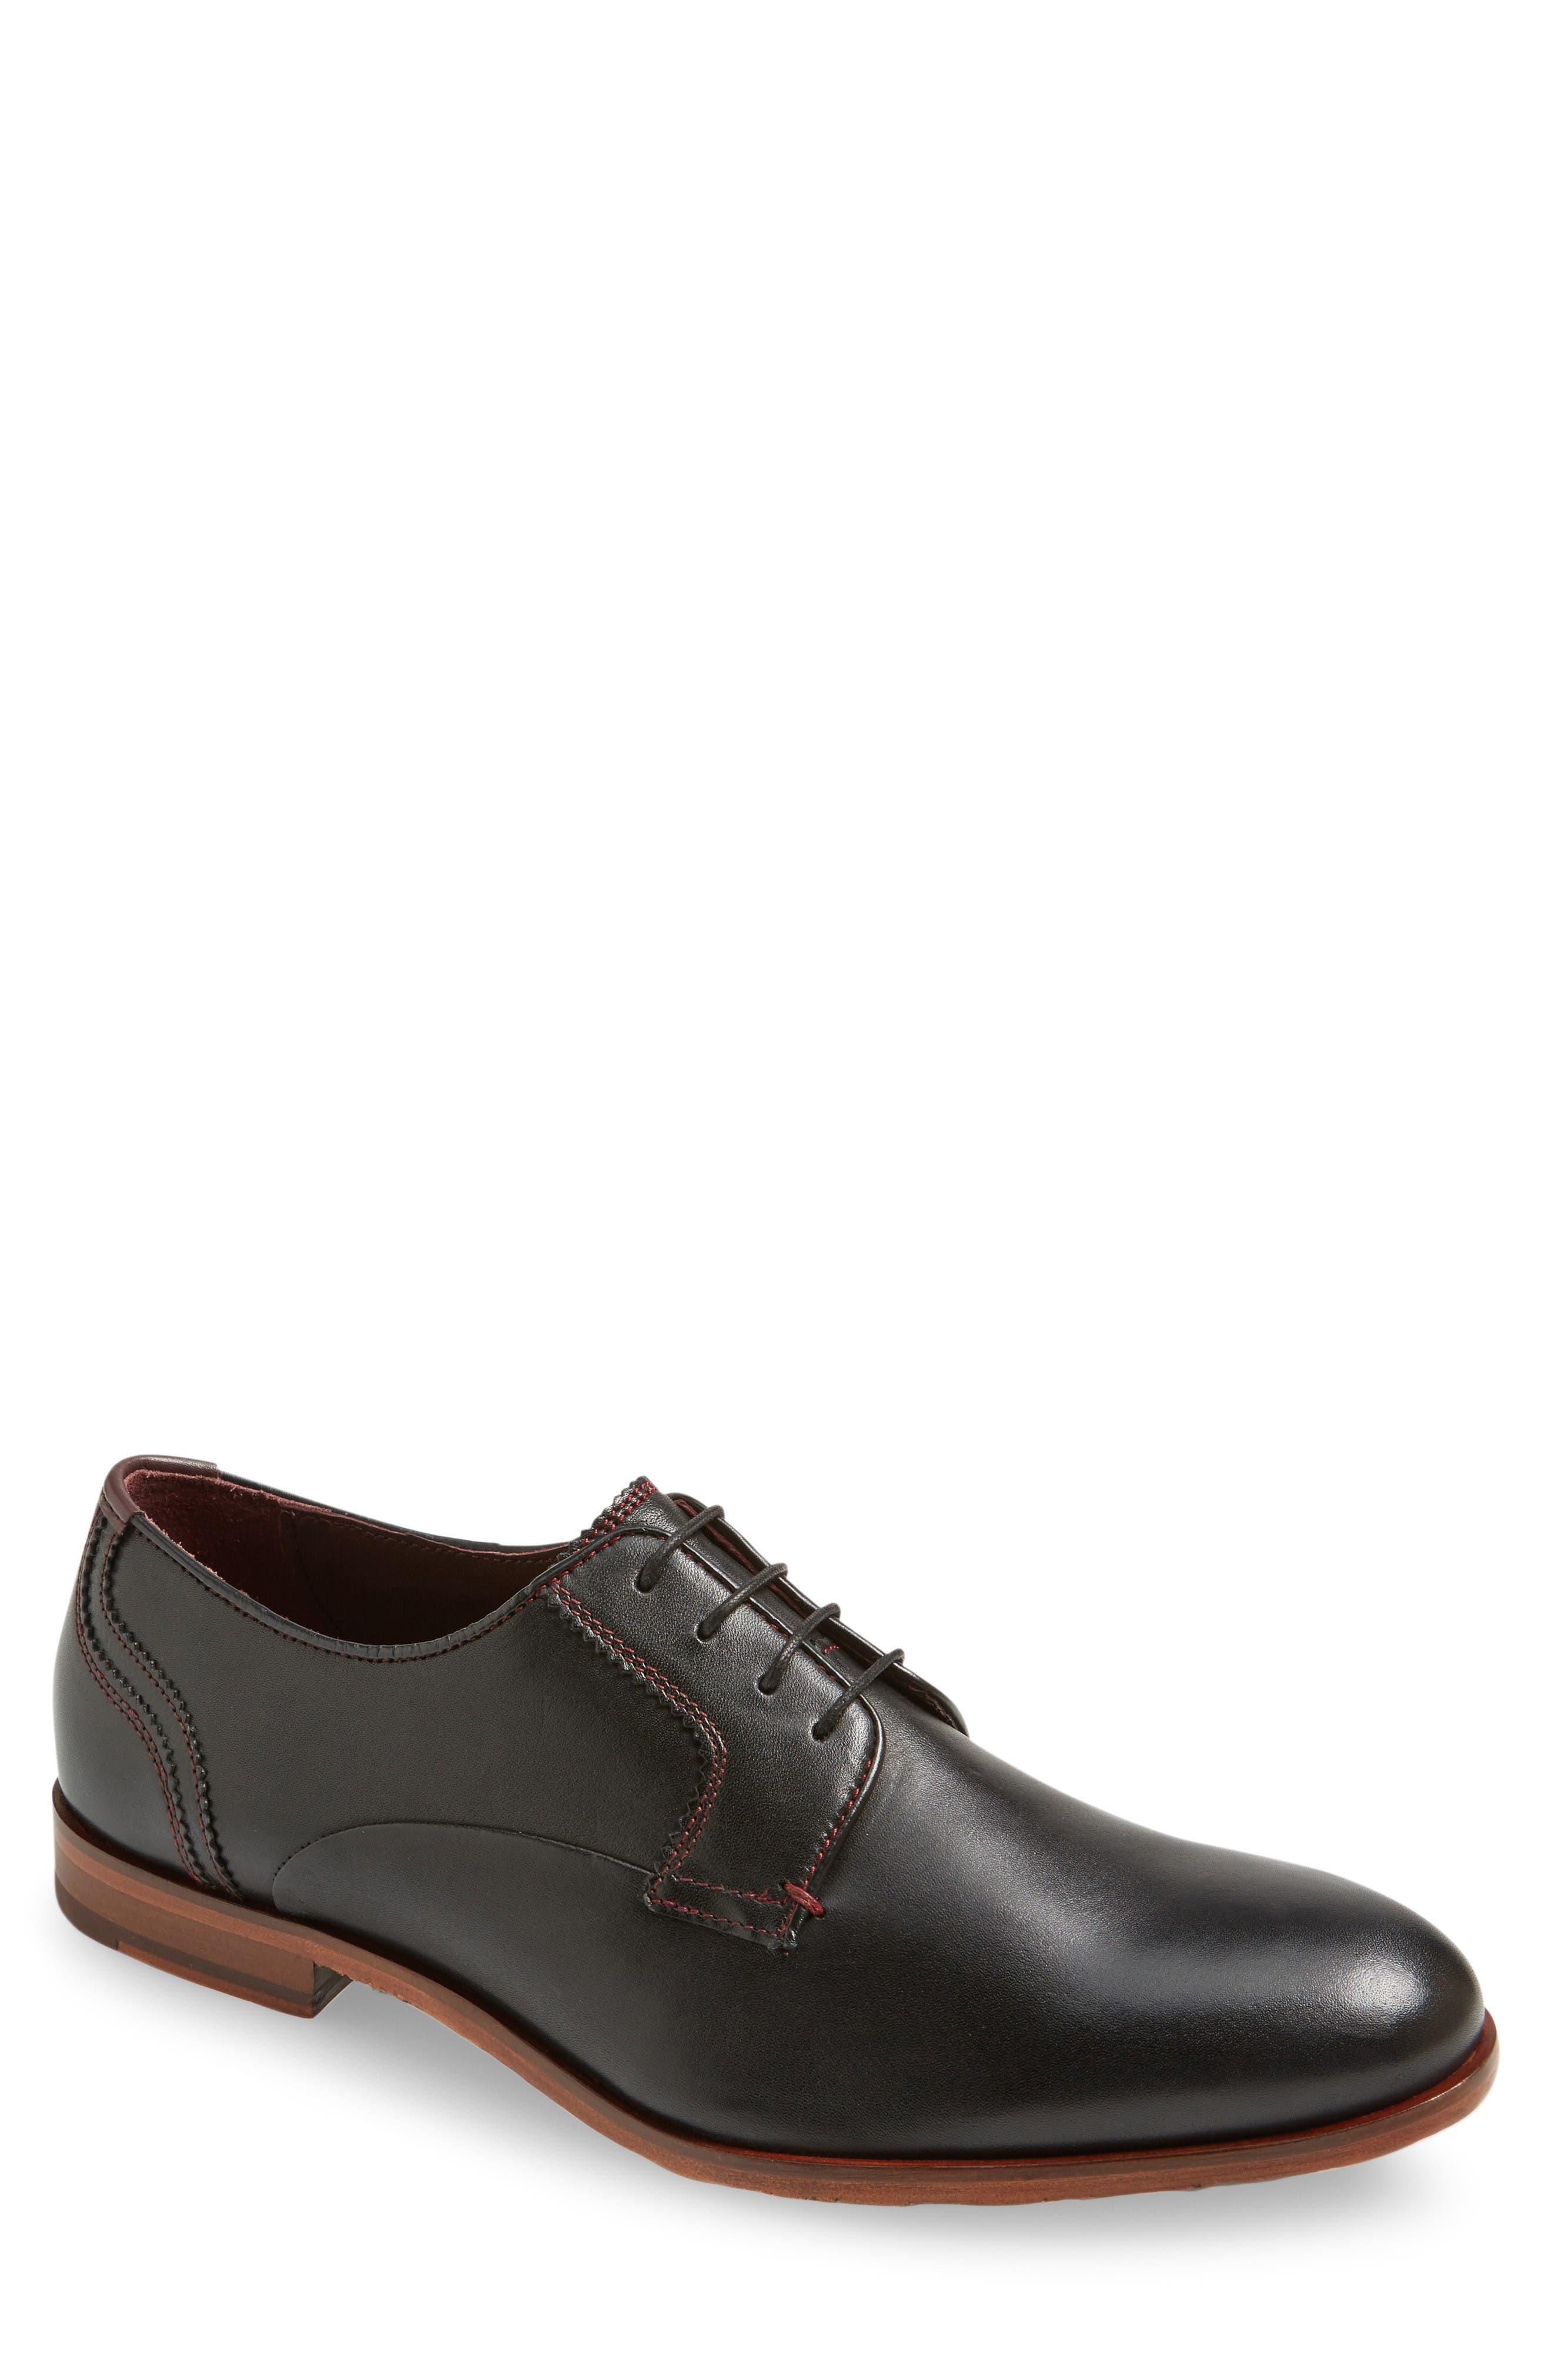 Iront Plain Toe Derby,                         Main,                         color, Black Leather